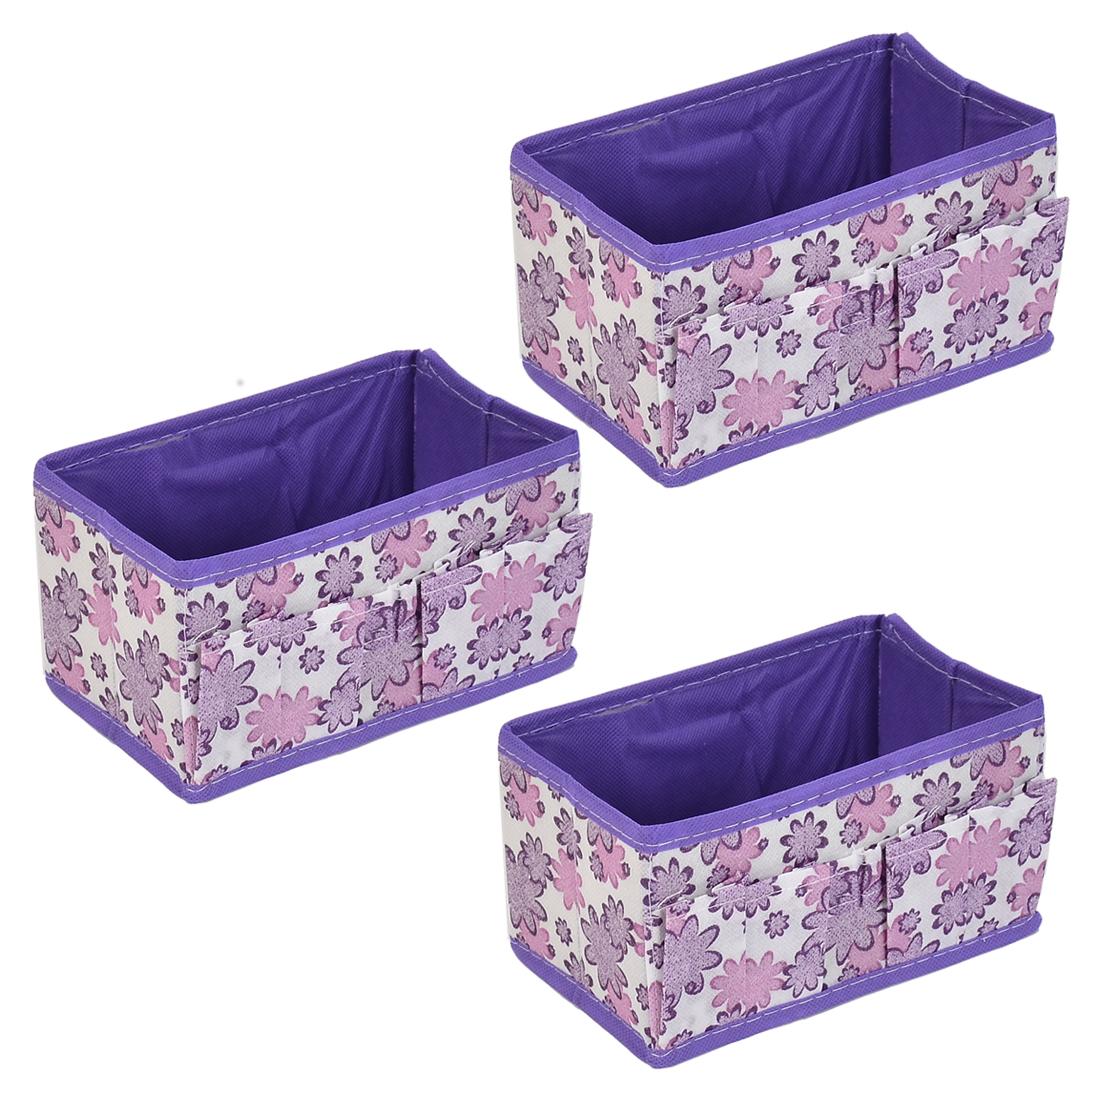 Household Sundries Floral Pattern Storage Box Case Organizer Purple 3 Pcs